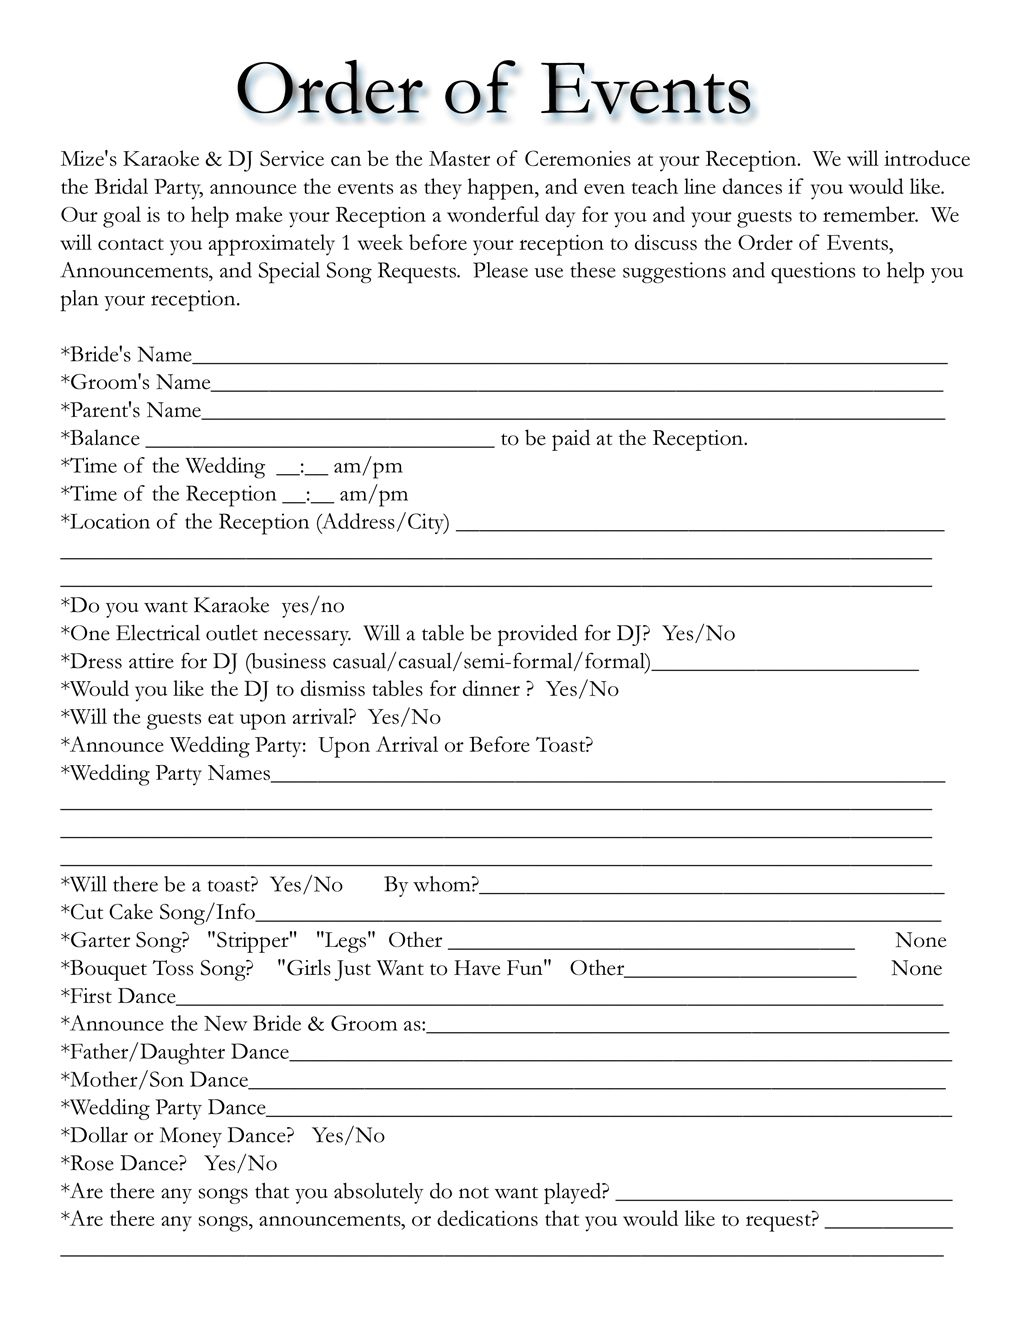 Wedding Itinerary Templates Free   Wedding Template   Mobile Dj - Free Printable Wedding Party List